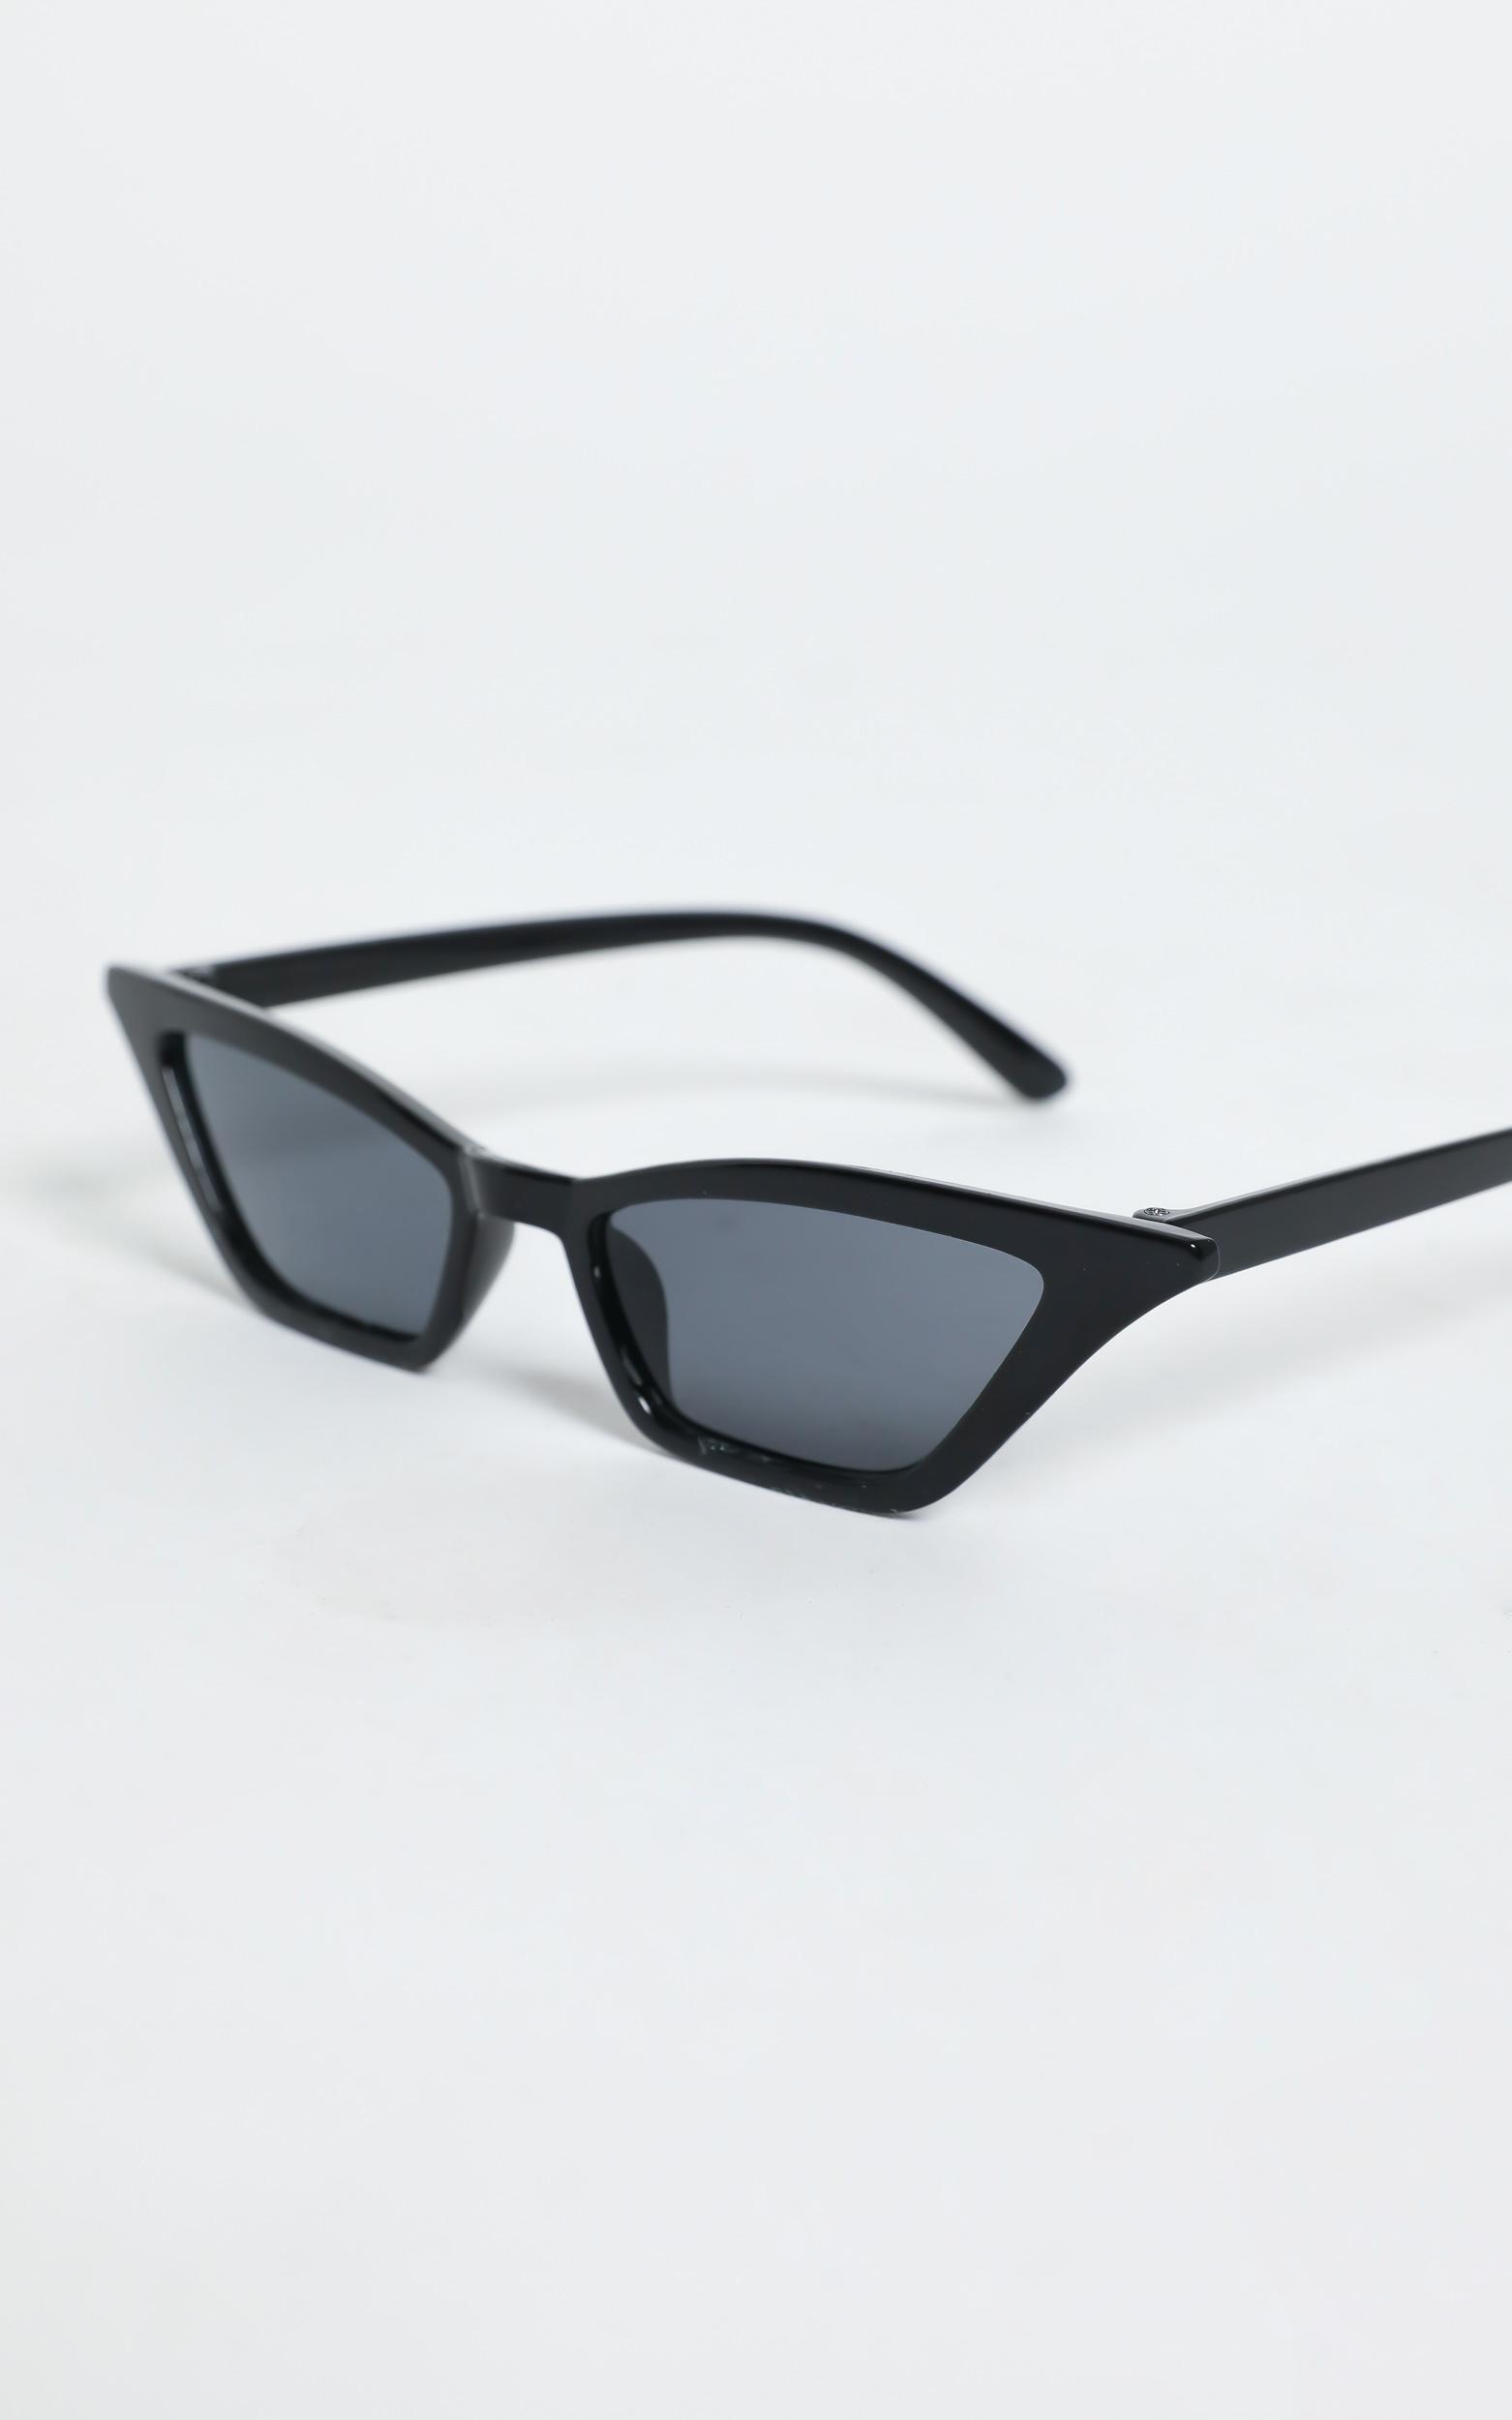 Carmela Sunglasses in Black, Black, hi-res image number null